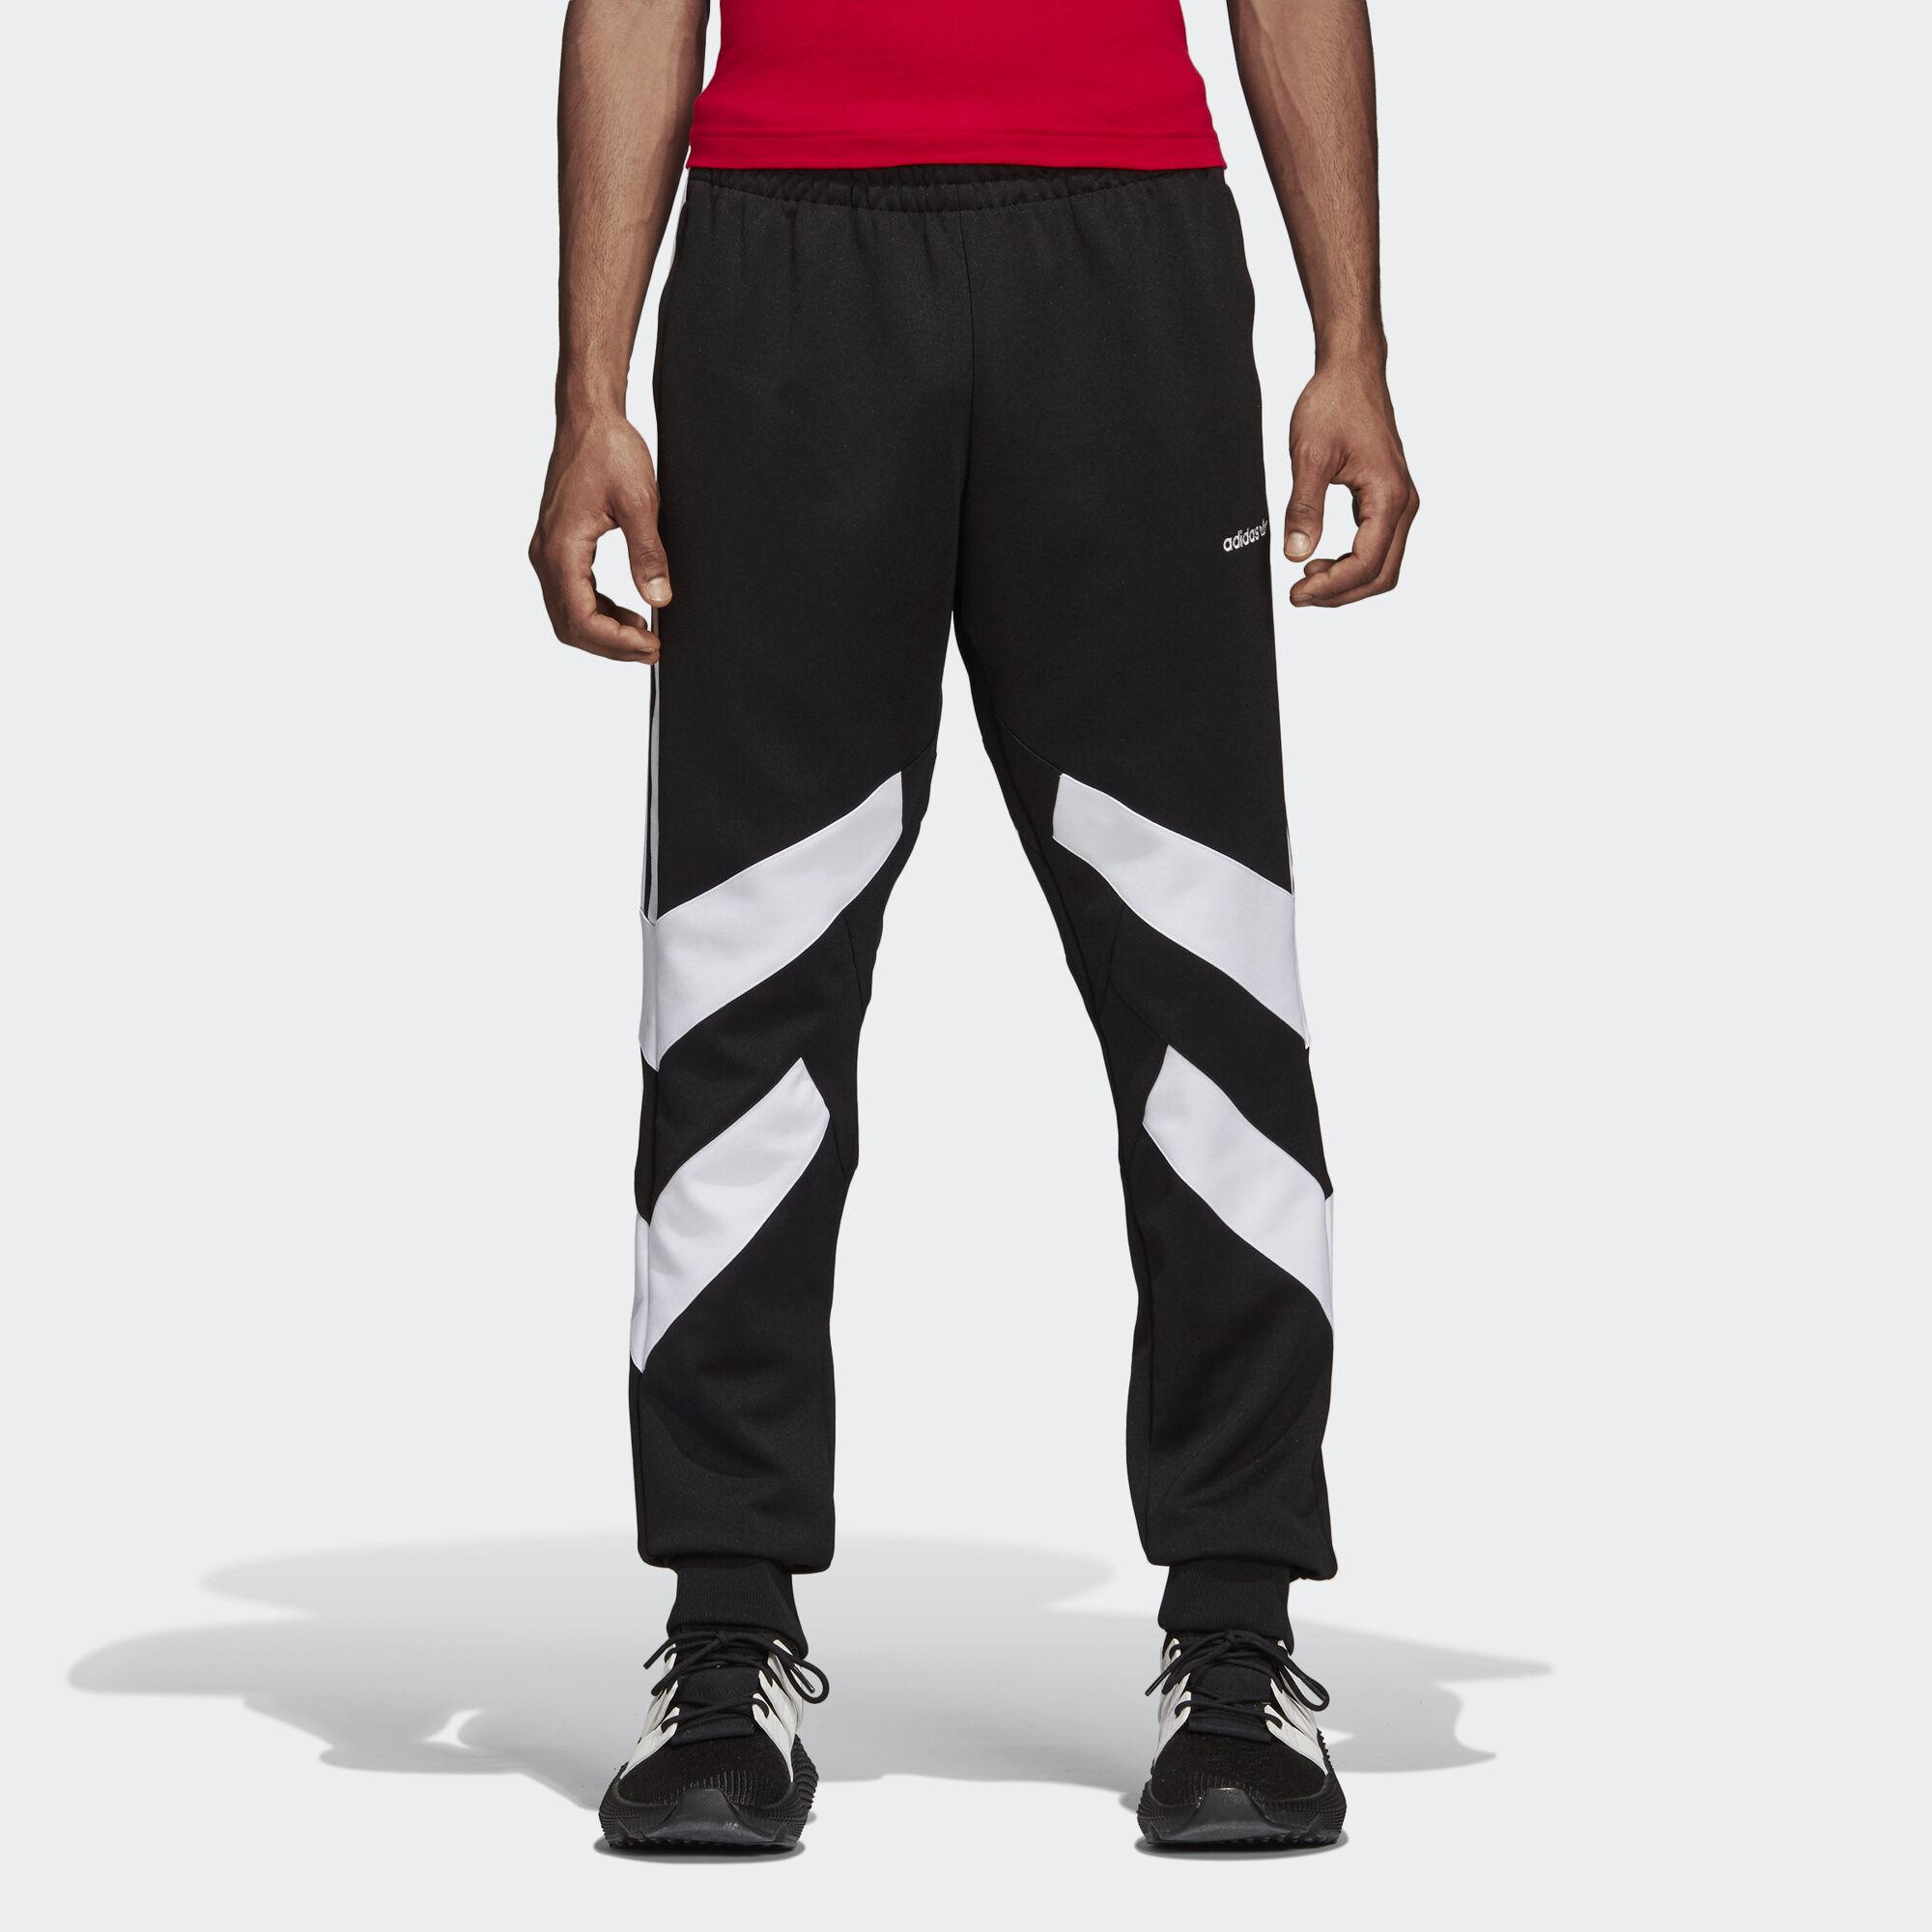 Fashionable palmeston sweatpants adidas Discount 2018 Unisex Clearance Huge Surprise K7Zbh63a